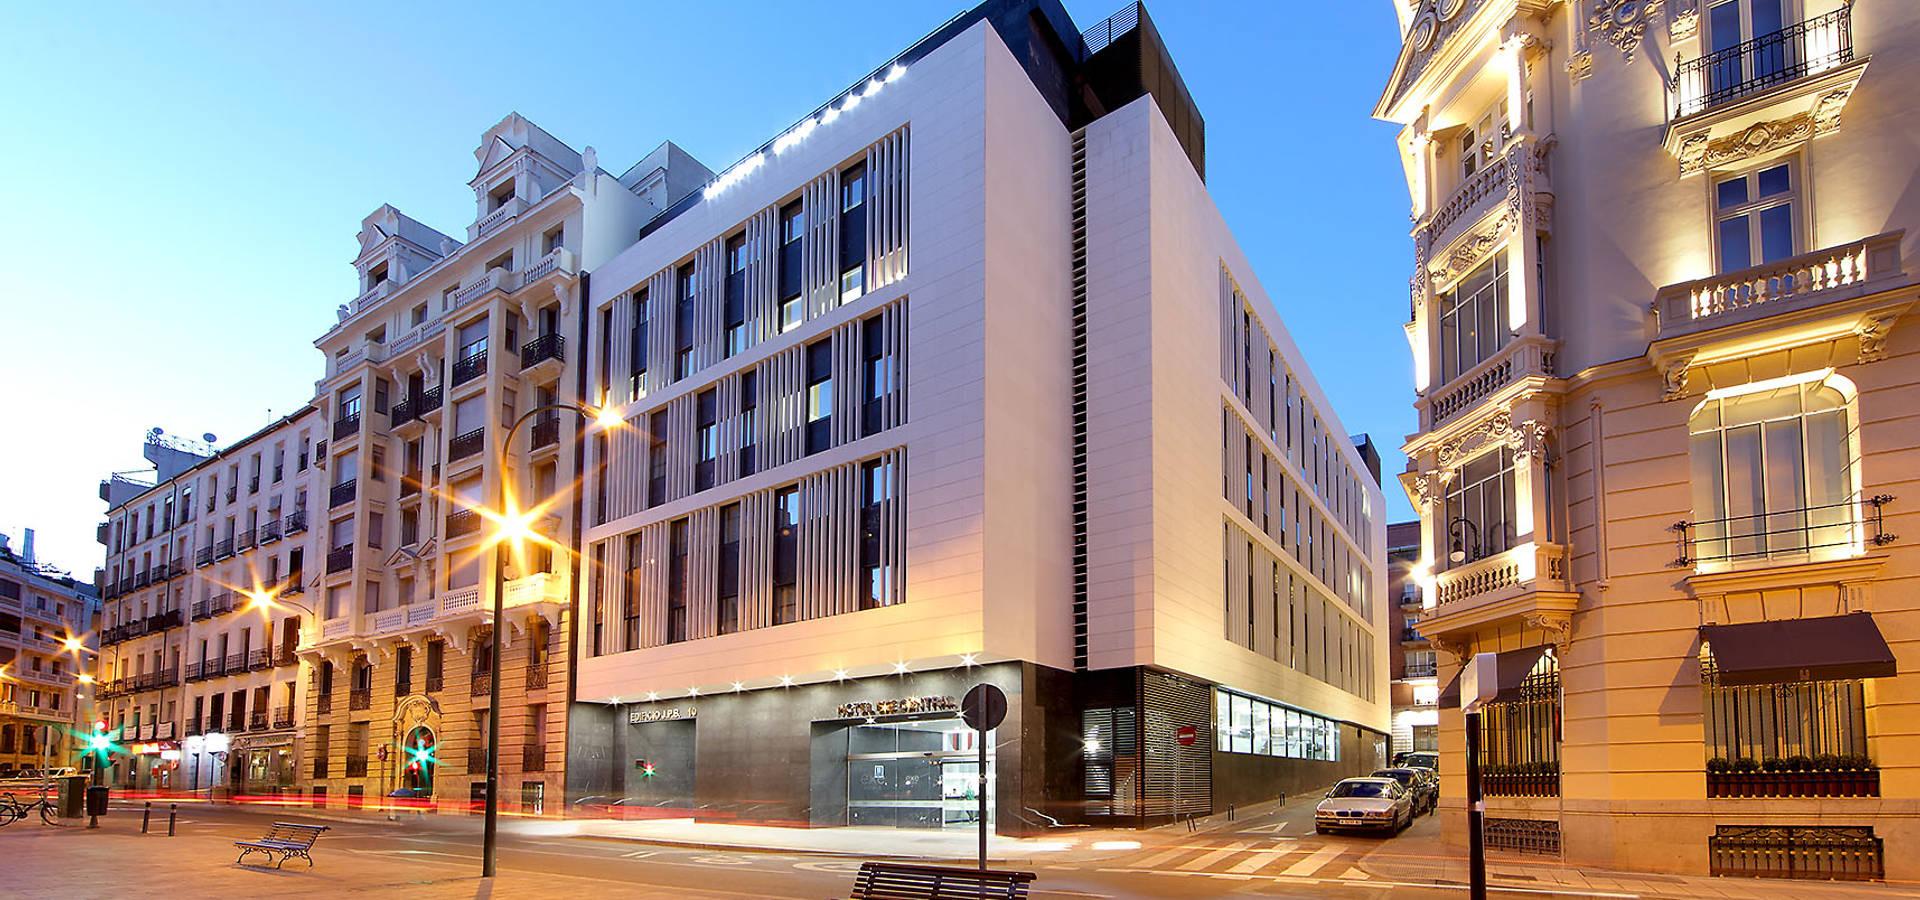 Hotel exe central madrid por laboratorio de arquitectura - Hotel exe central ...